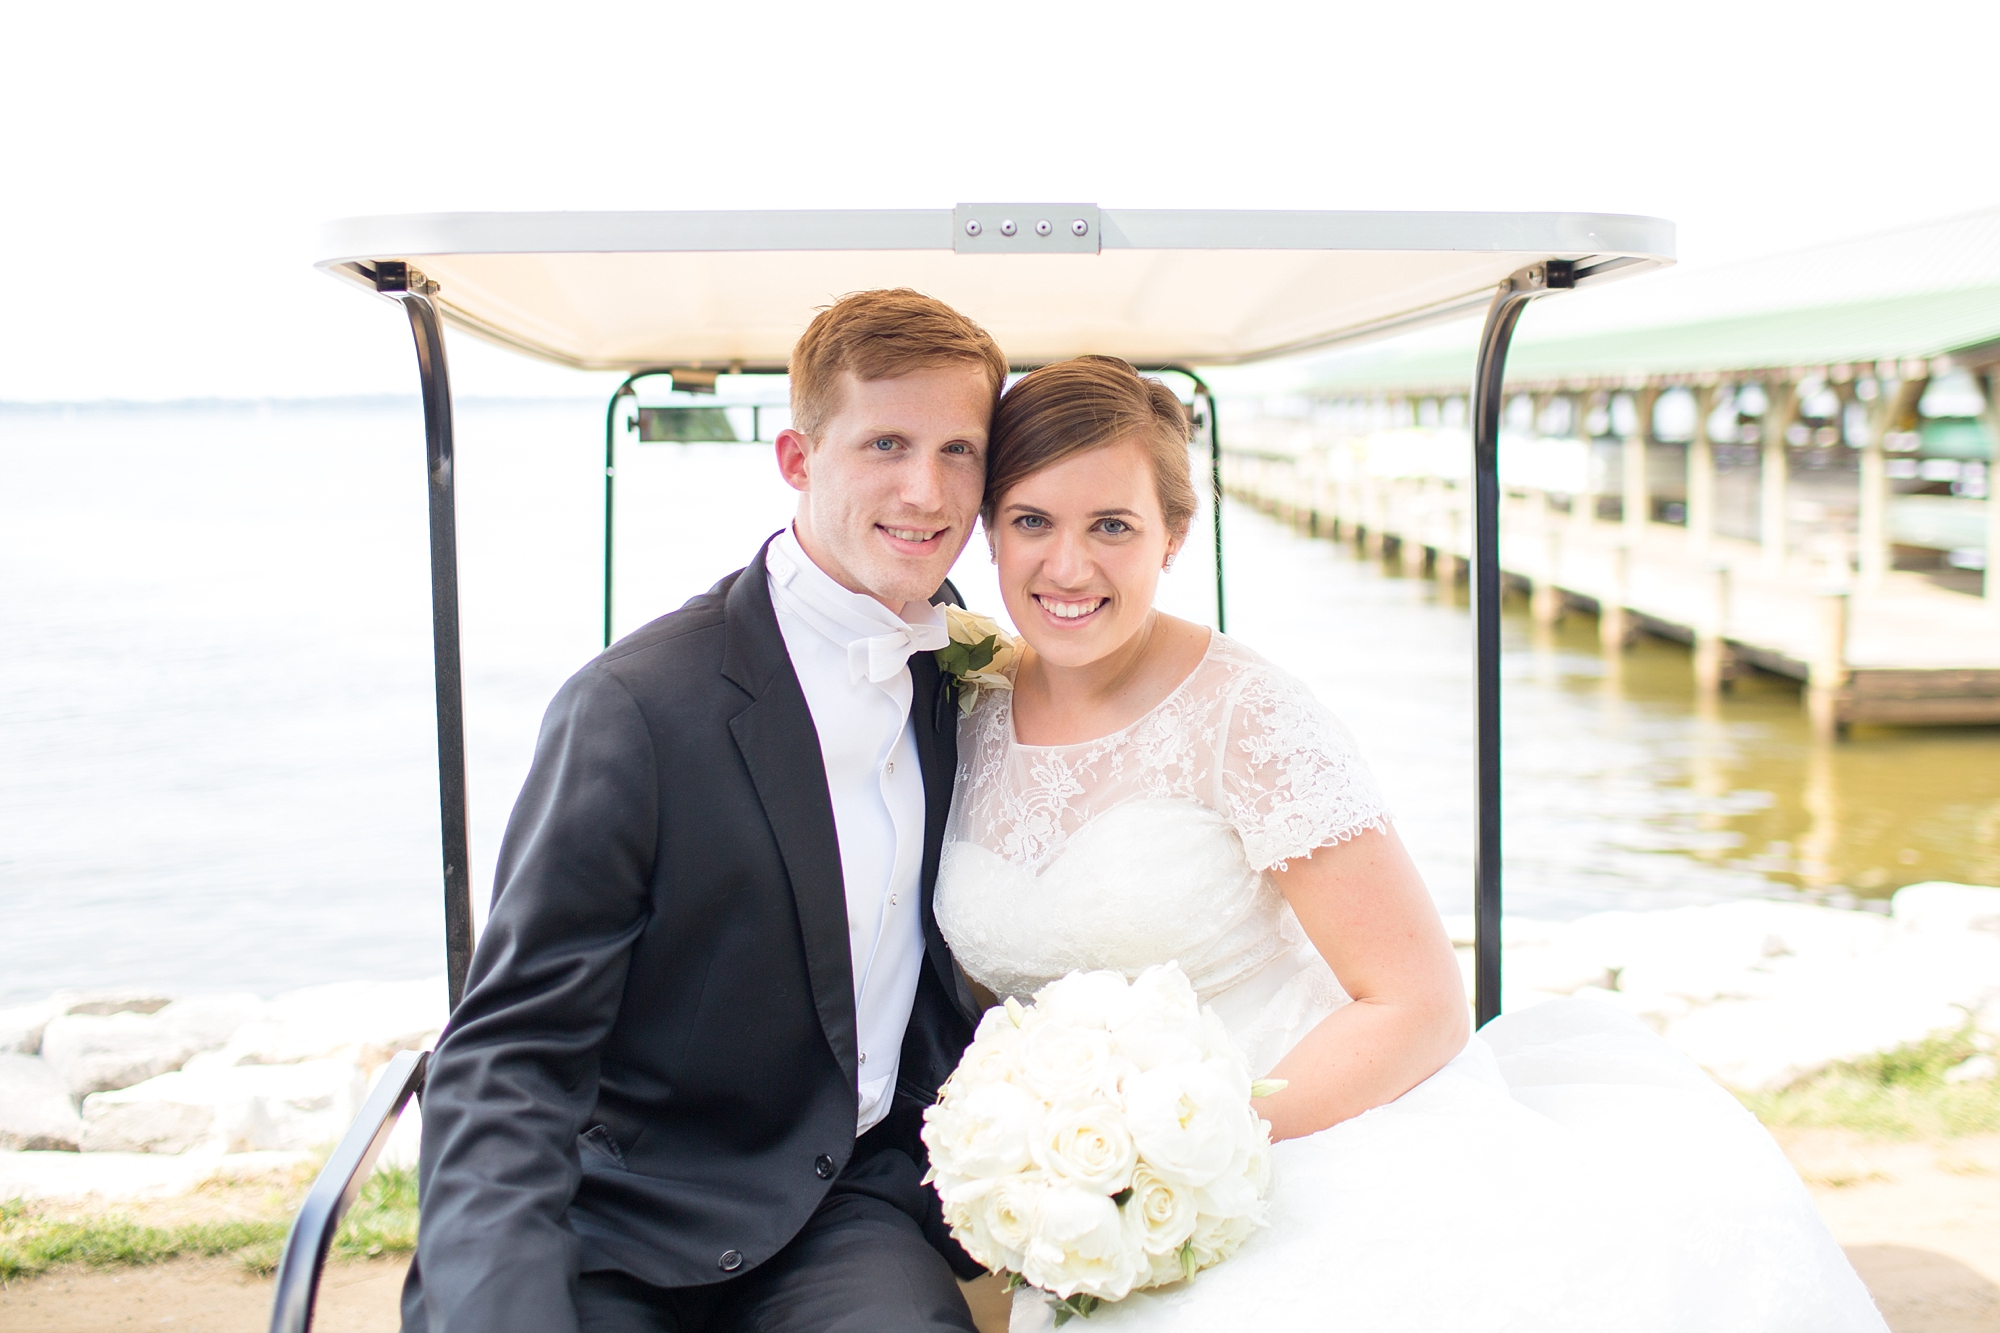 Somerville 4-Bride & Groom Portraits-1108_anna grace photography sherwood forest annapolis maryland wedding photographer photo.jpg